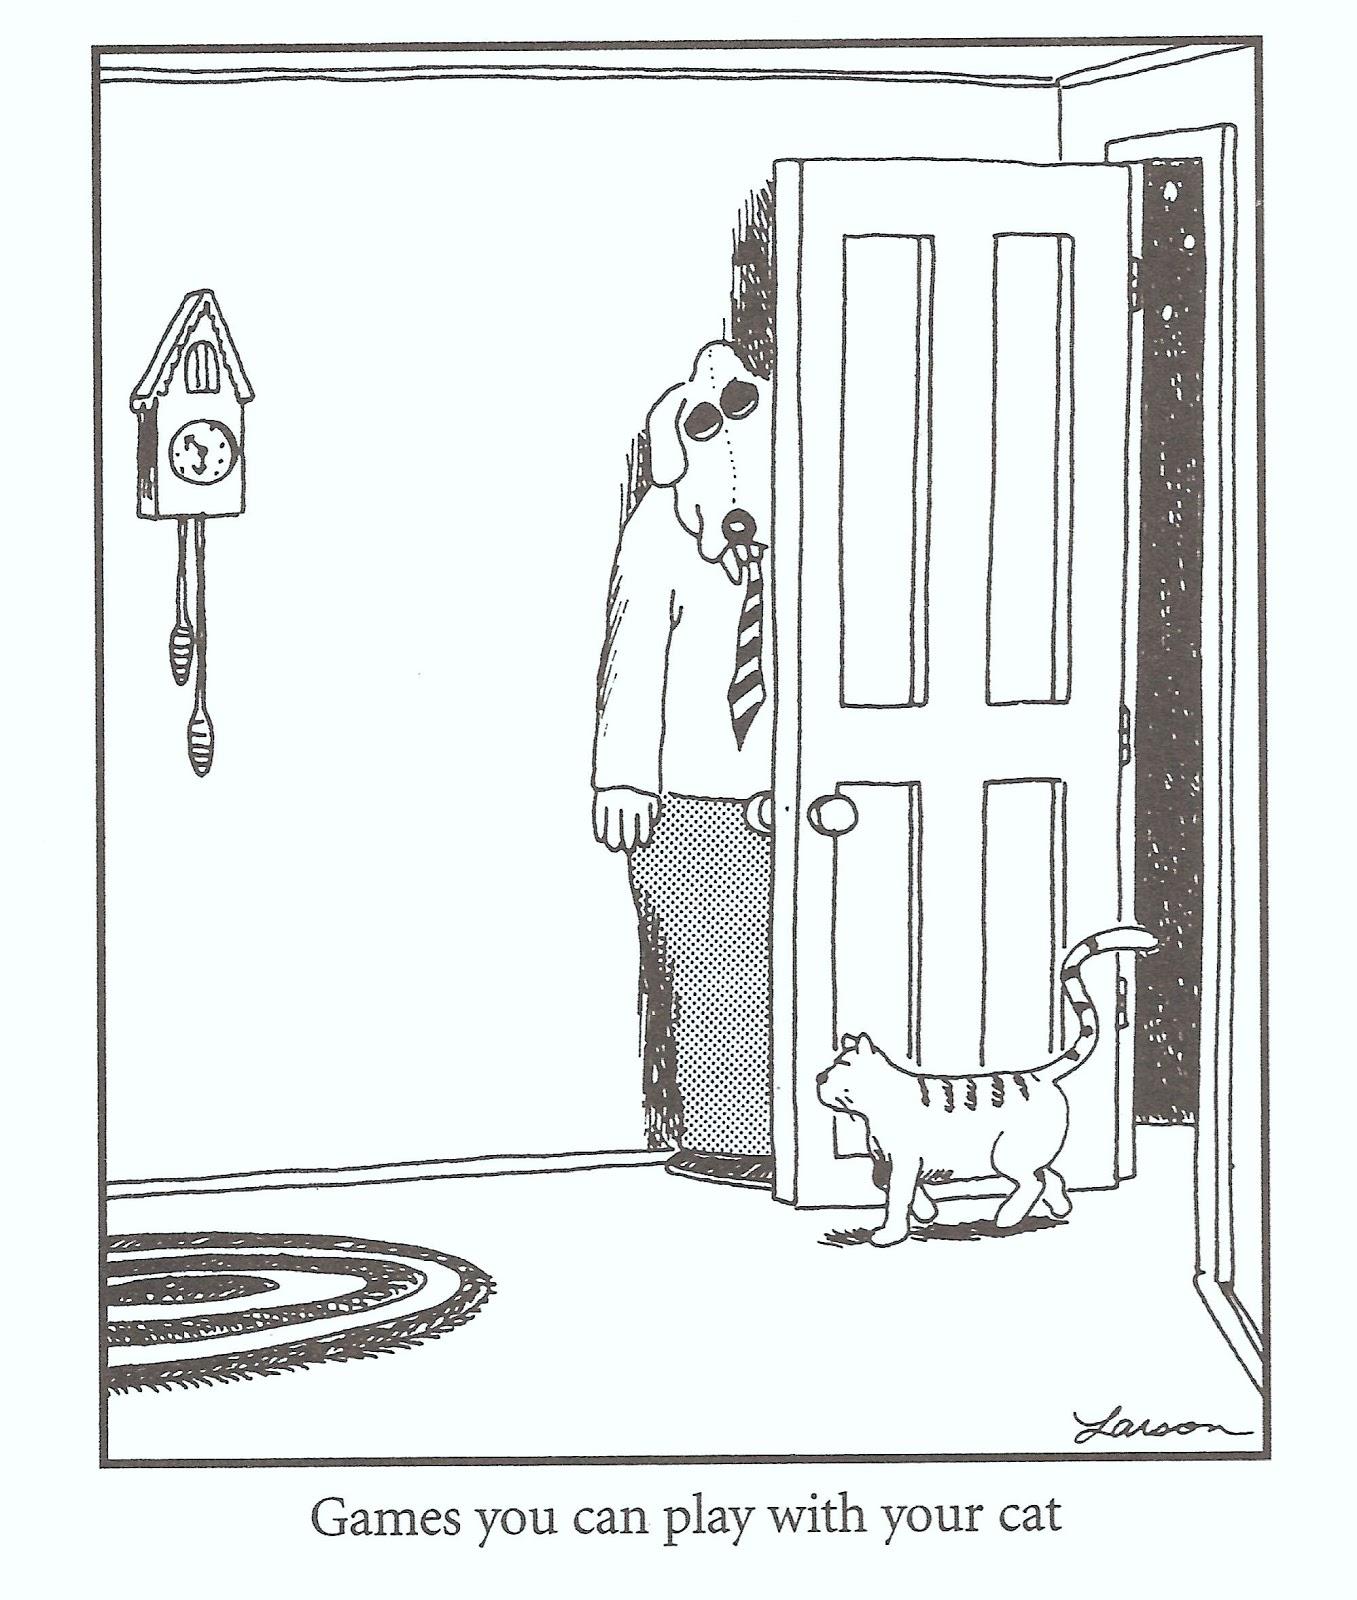 [Image: larson+dog.jpg]